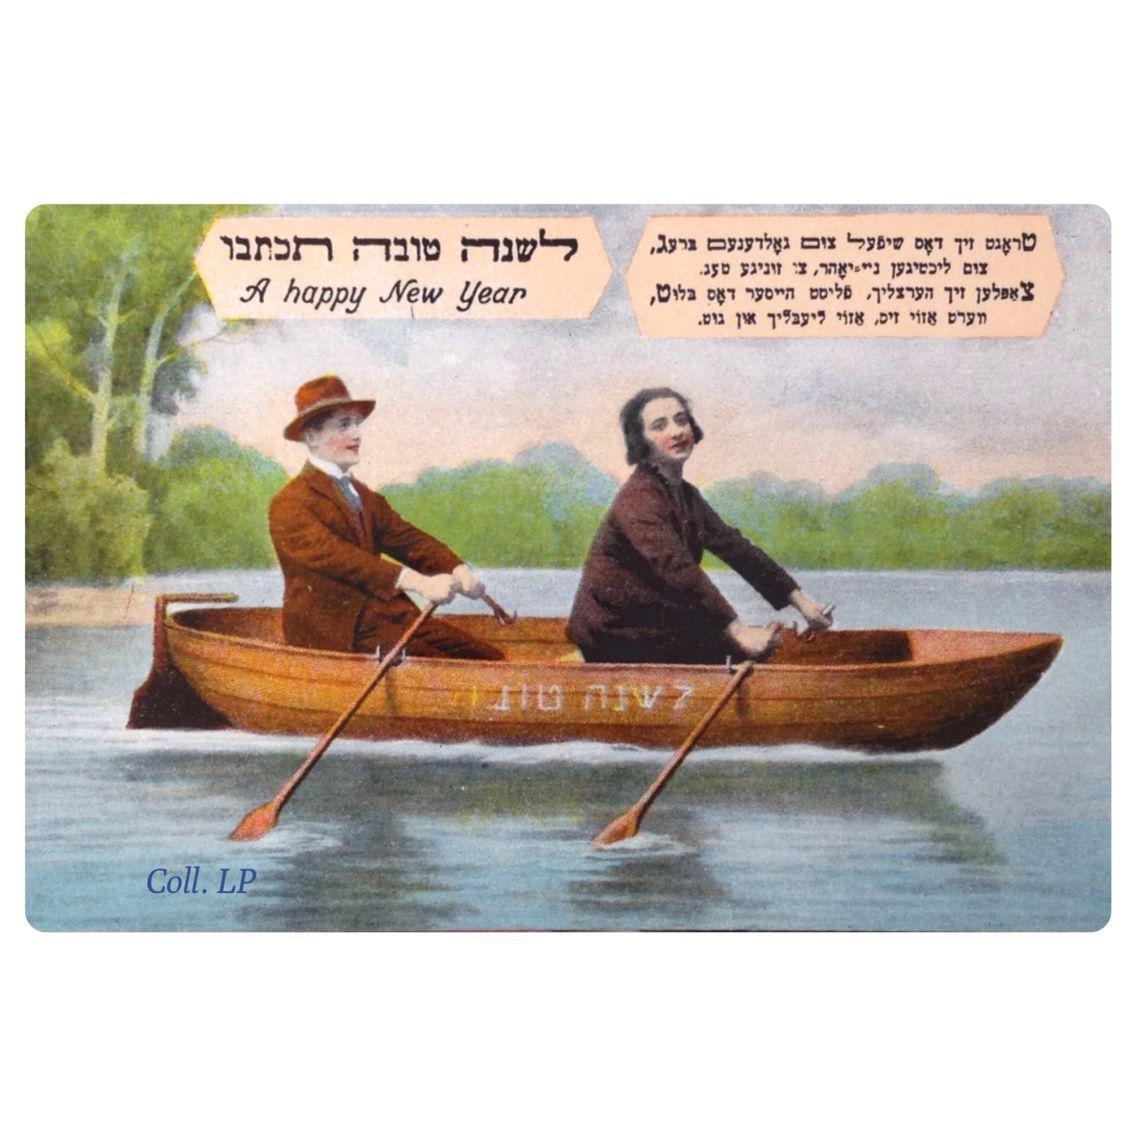 11 cartes postales chana tova 1910. Williamsburg Art. Co. New York